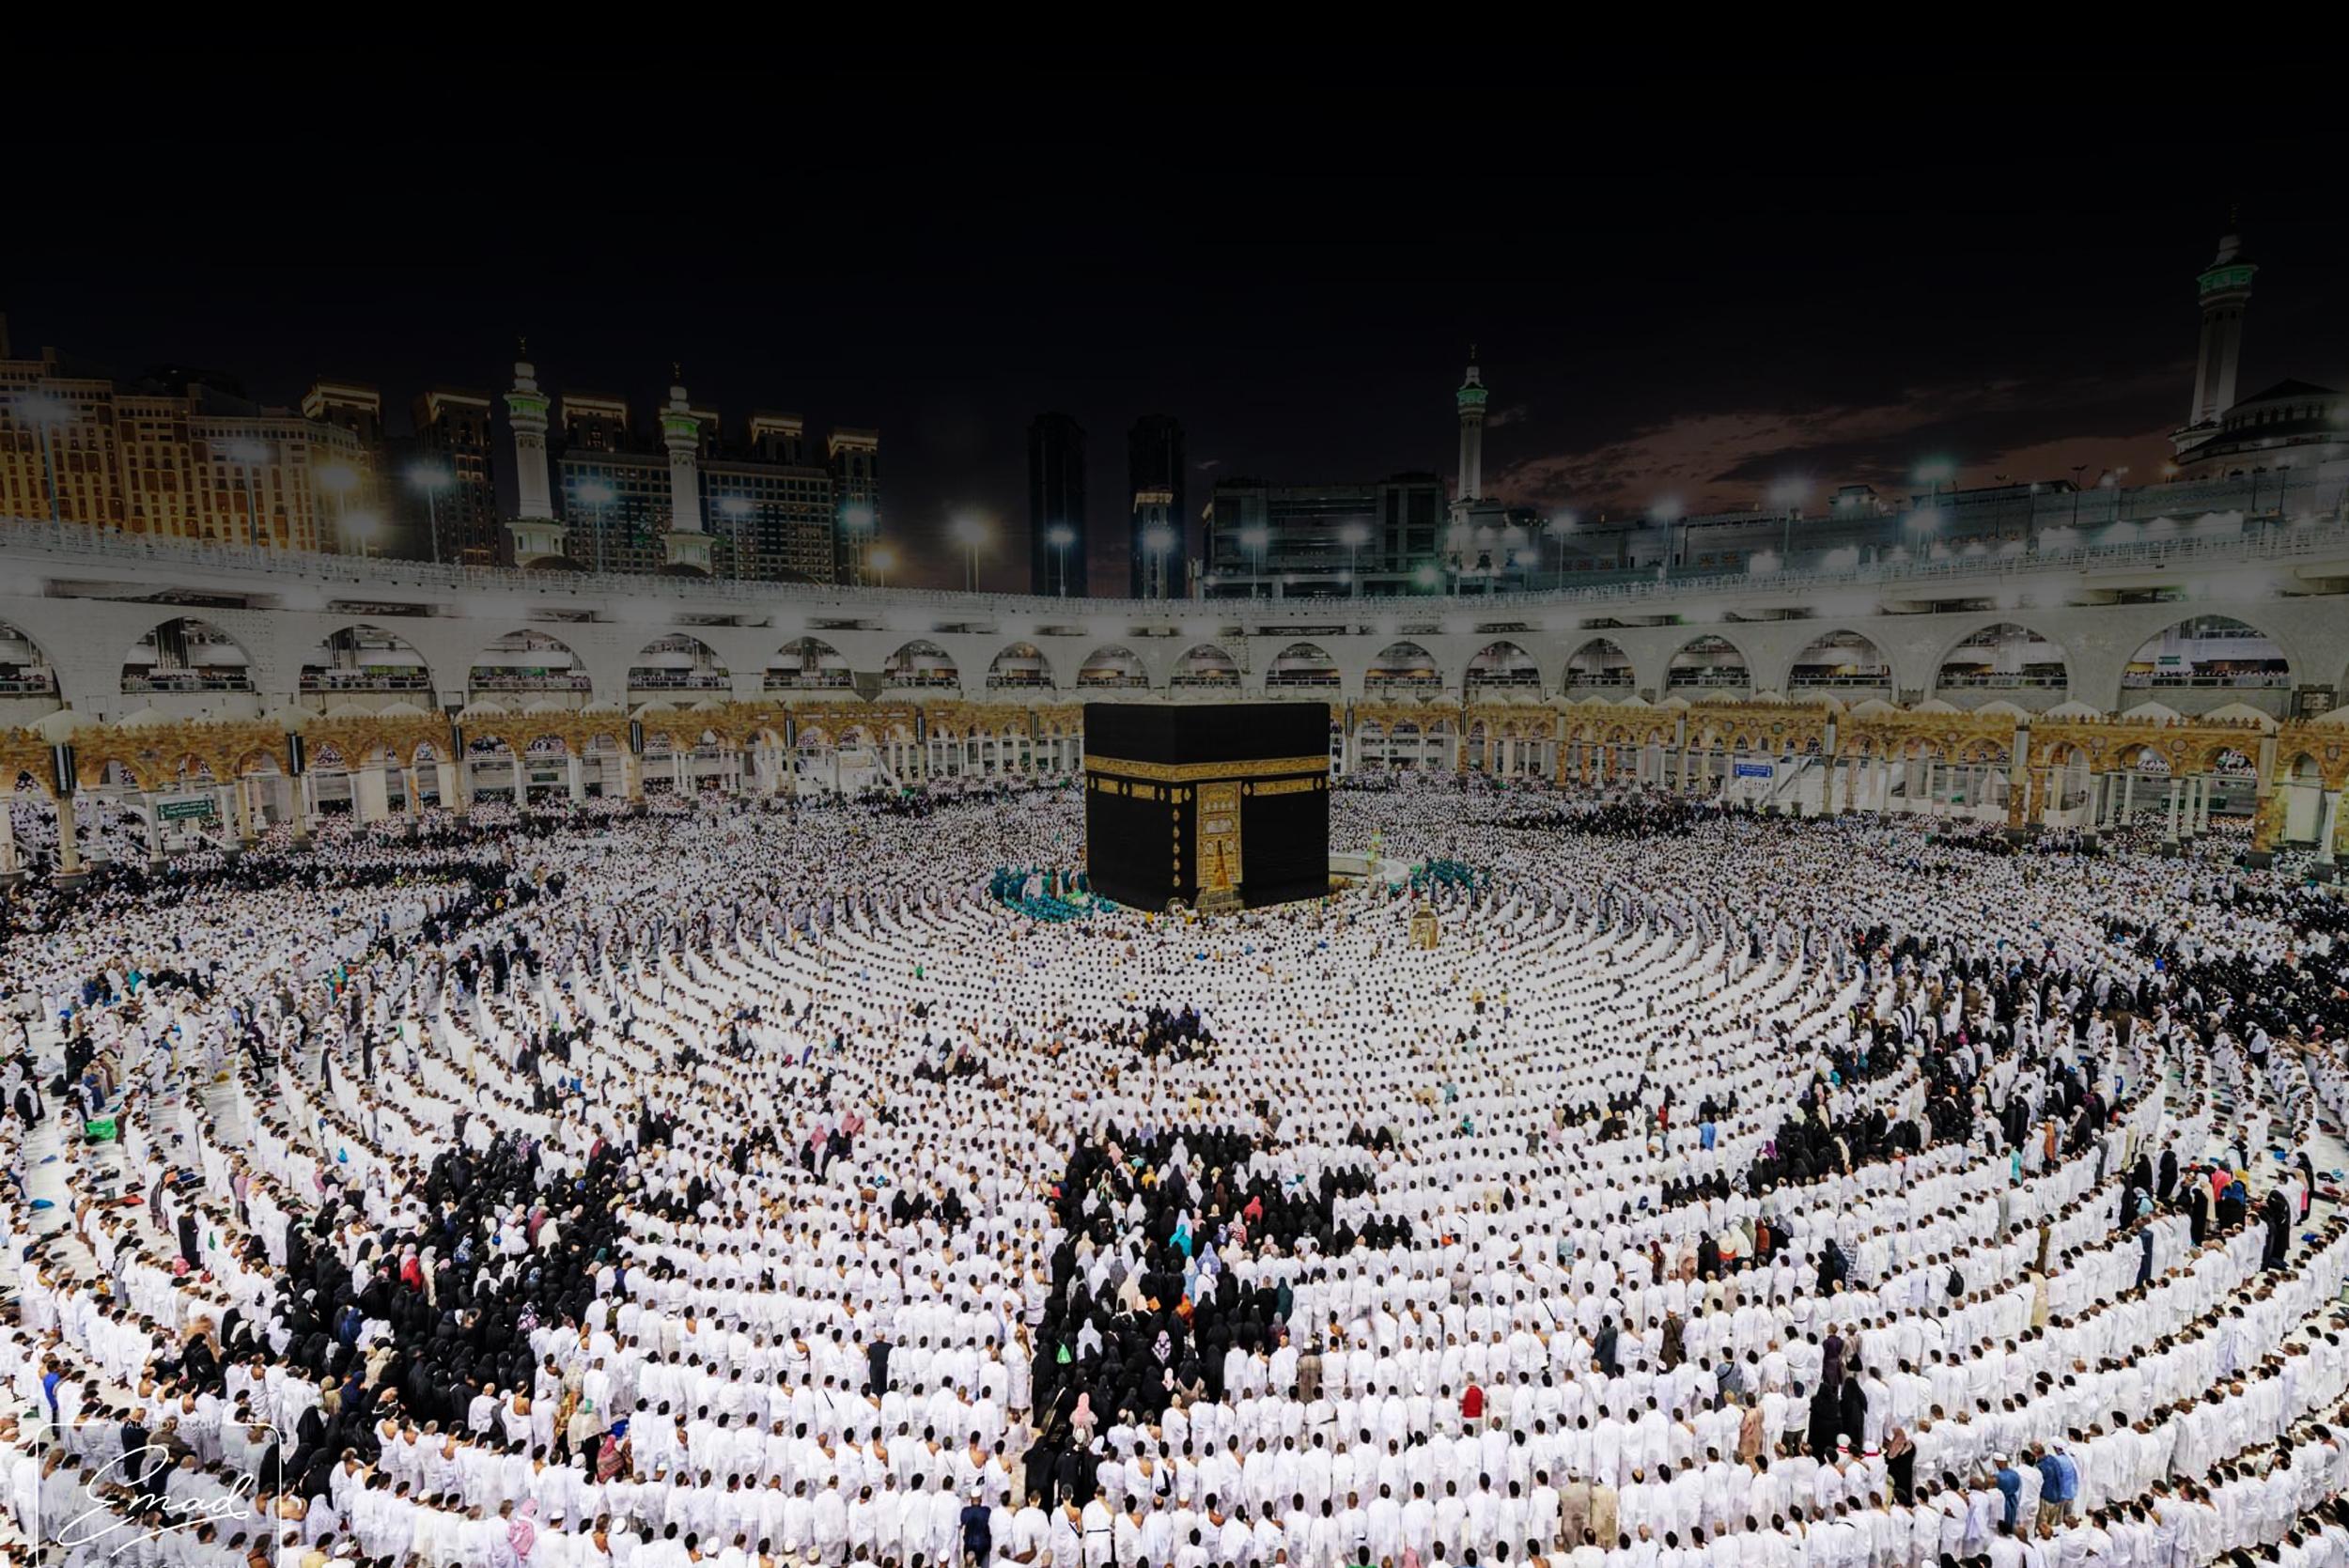 Sayyidul Istighfar- The best way to seek forgiveness